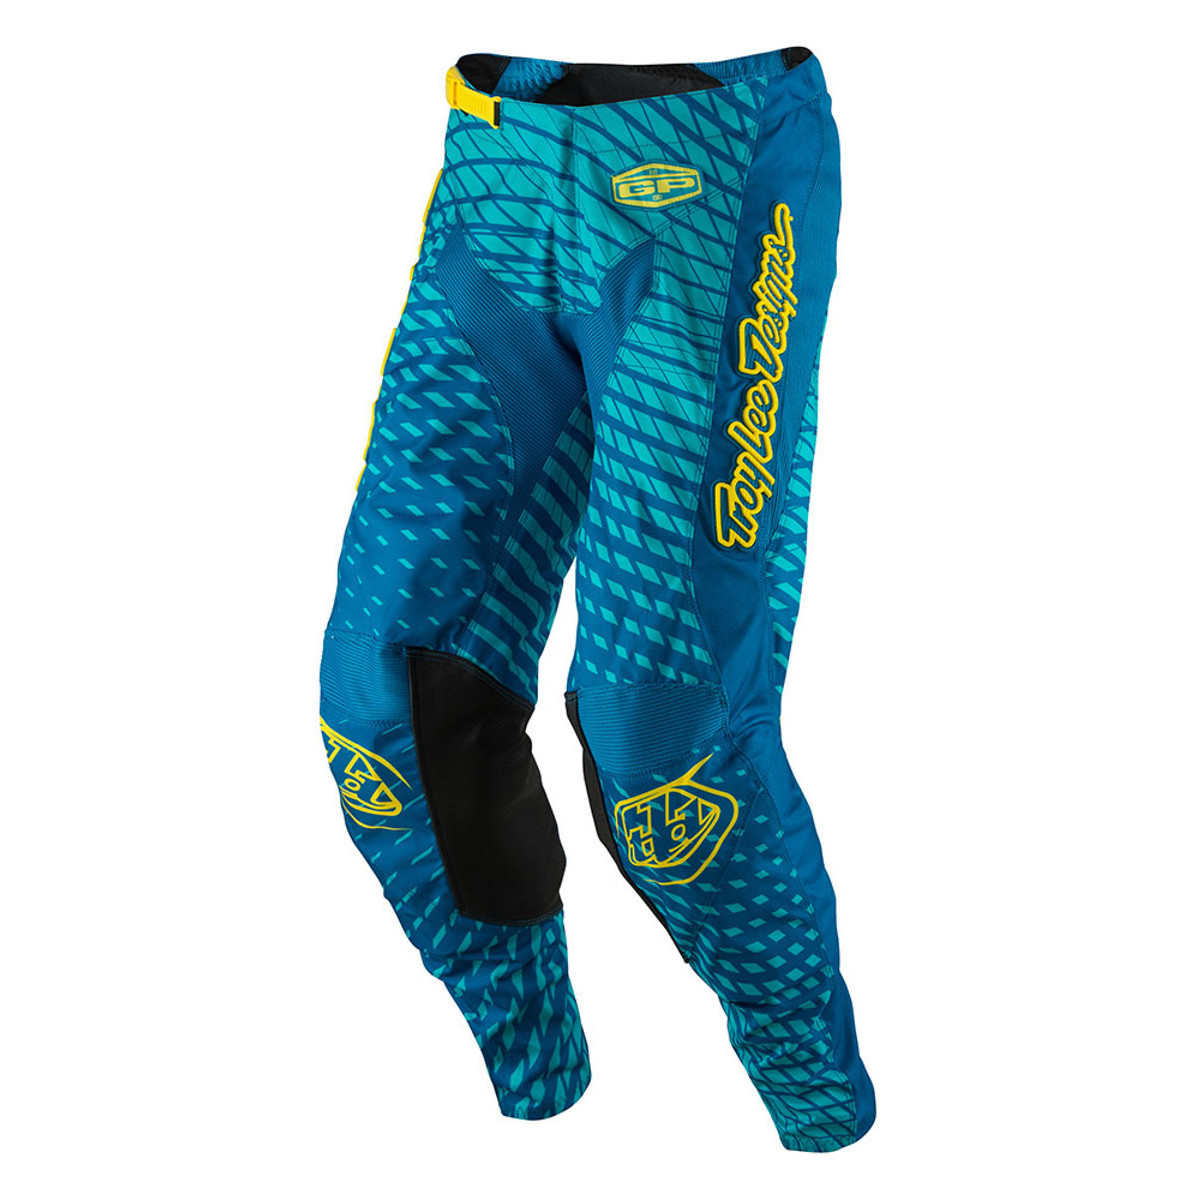 Troy Lee Designs GP Pants  TLD GP Moto Pants - Tremor Blue:Yellow